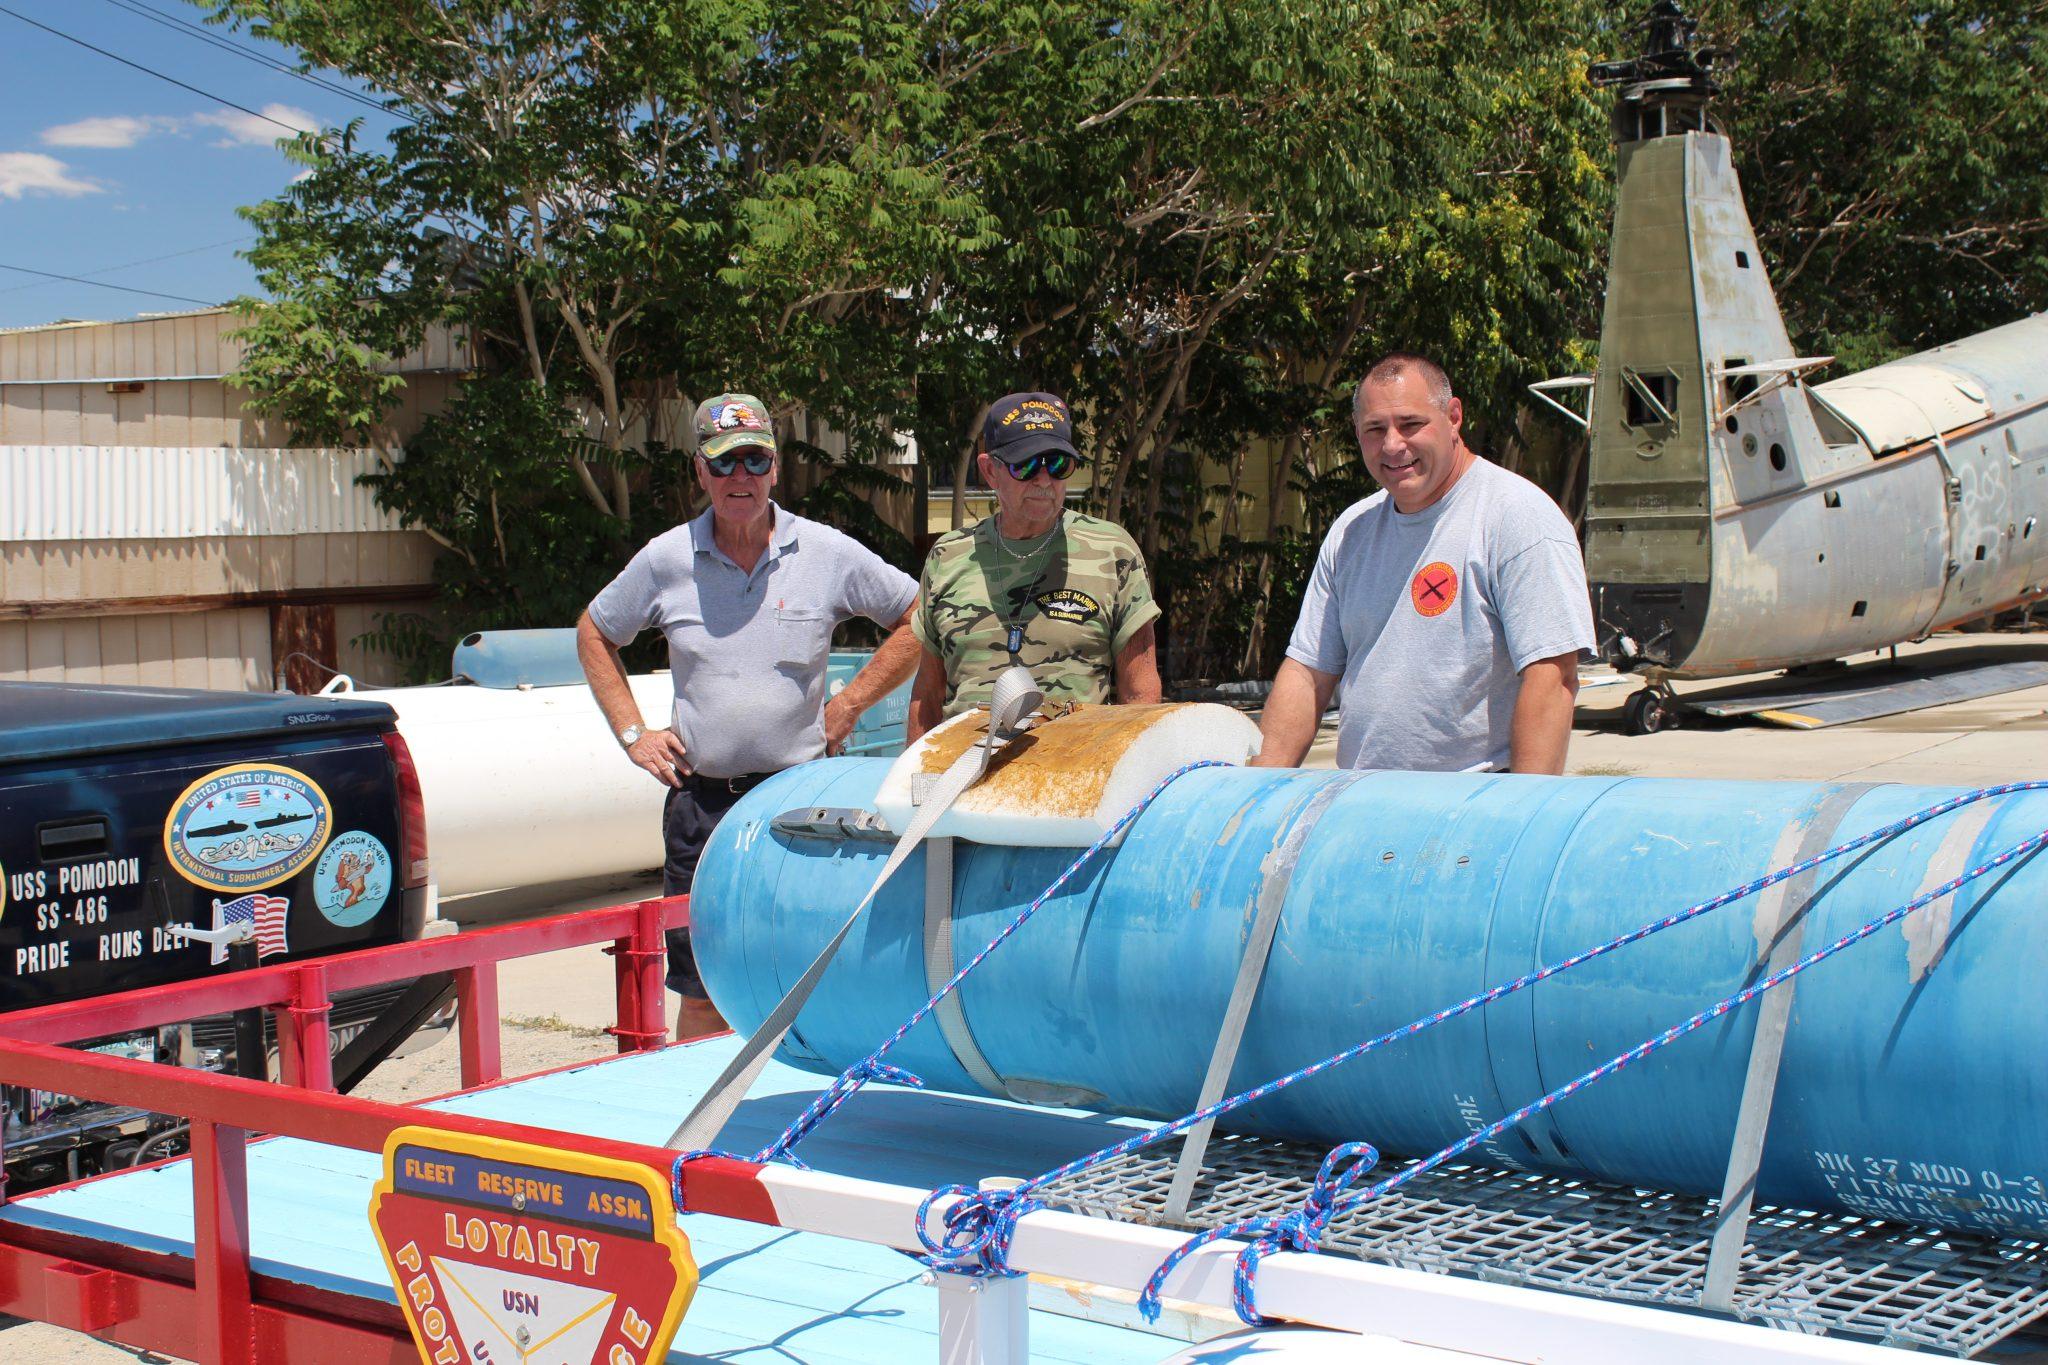 Torpedo donated to Fleet Reserve Association